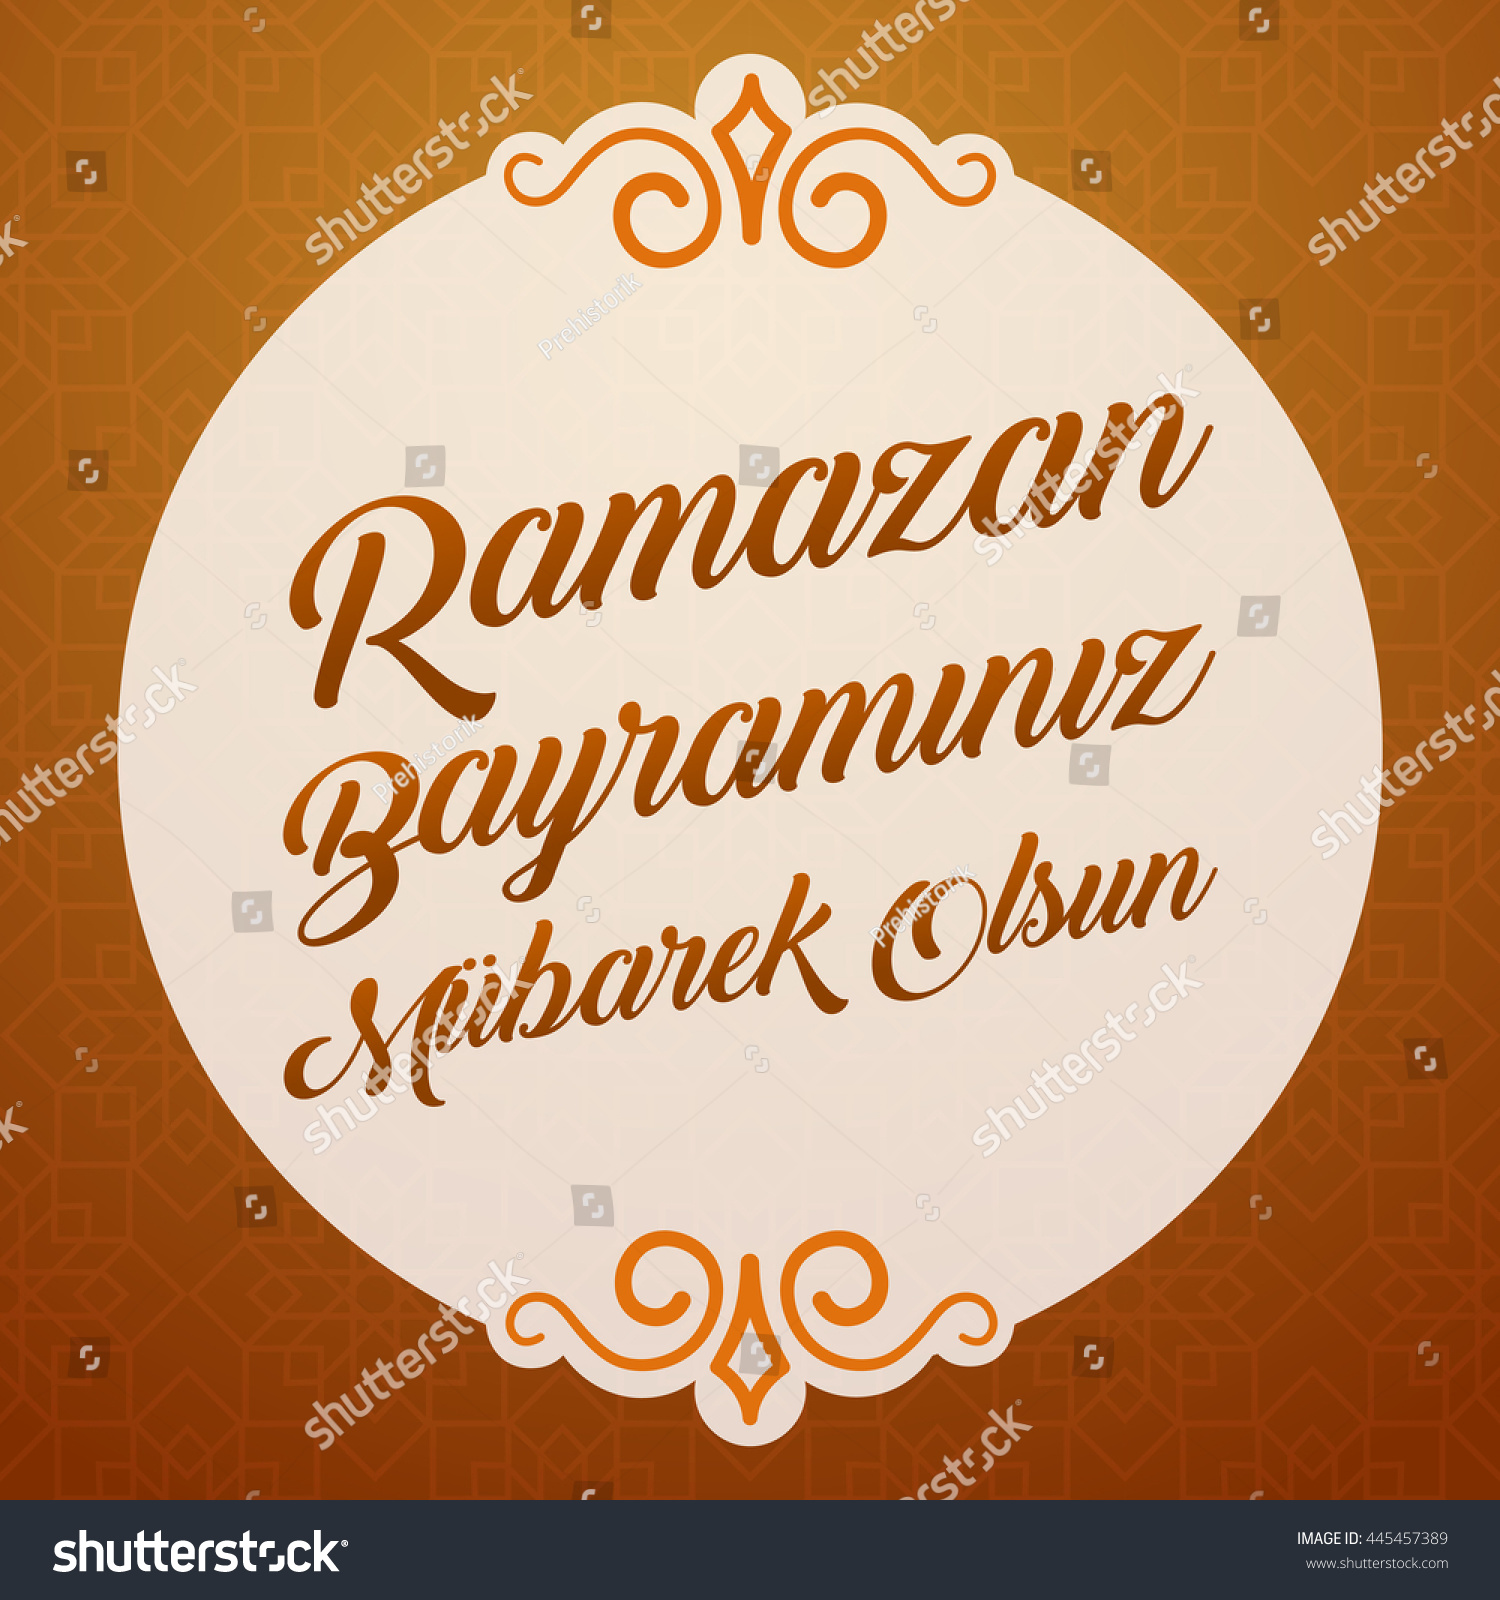 Feast ramadan candy ramadan candy festival stock vector 445457389 feast of ramadan and candy ramadan and candy festival greeting turkish ramazan bayraminiz m4hsunfo